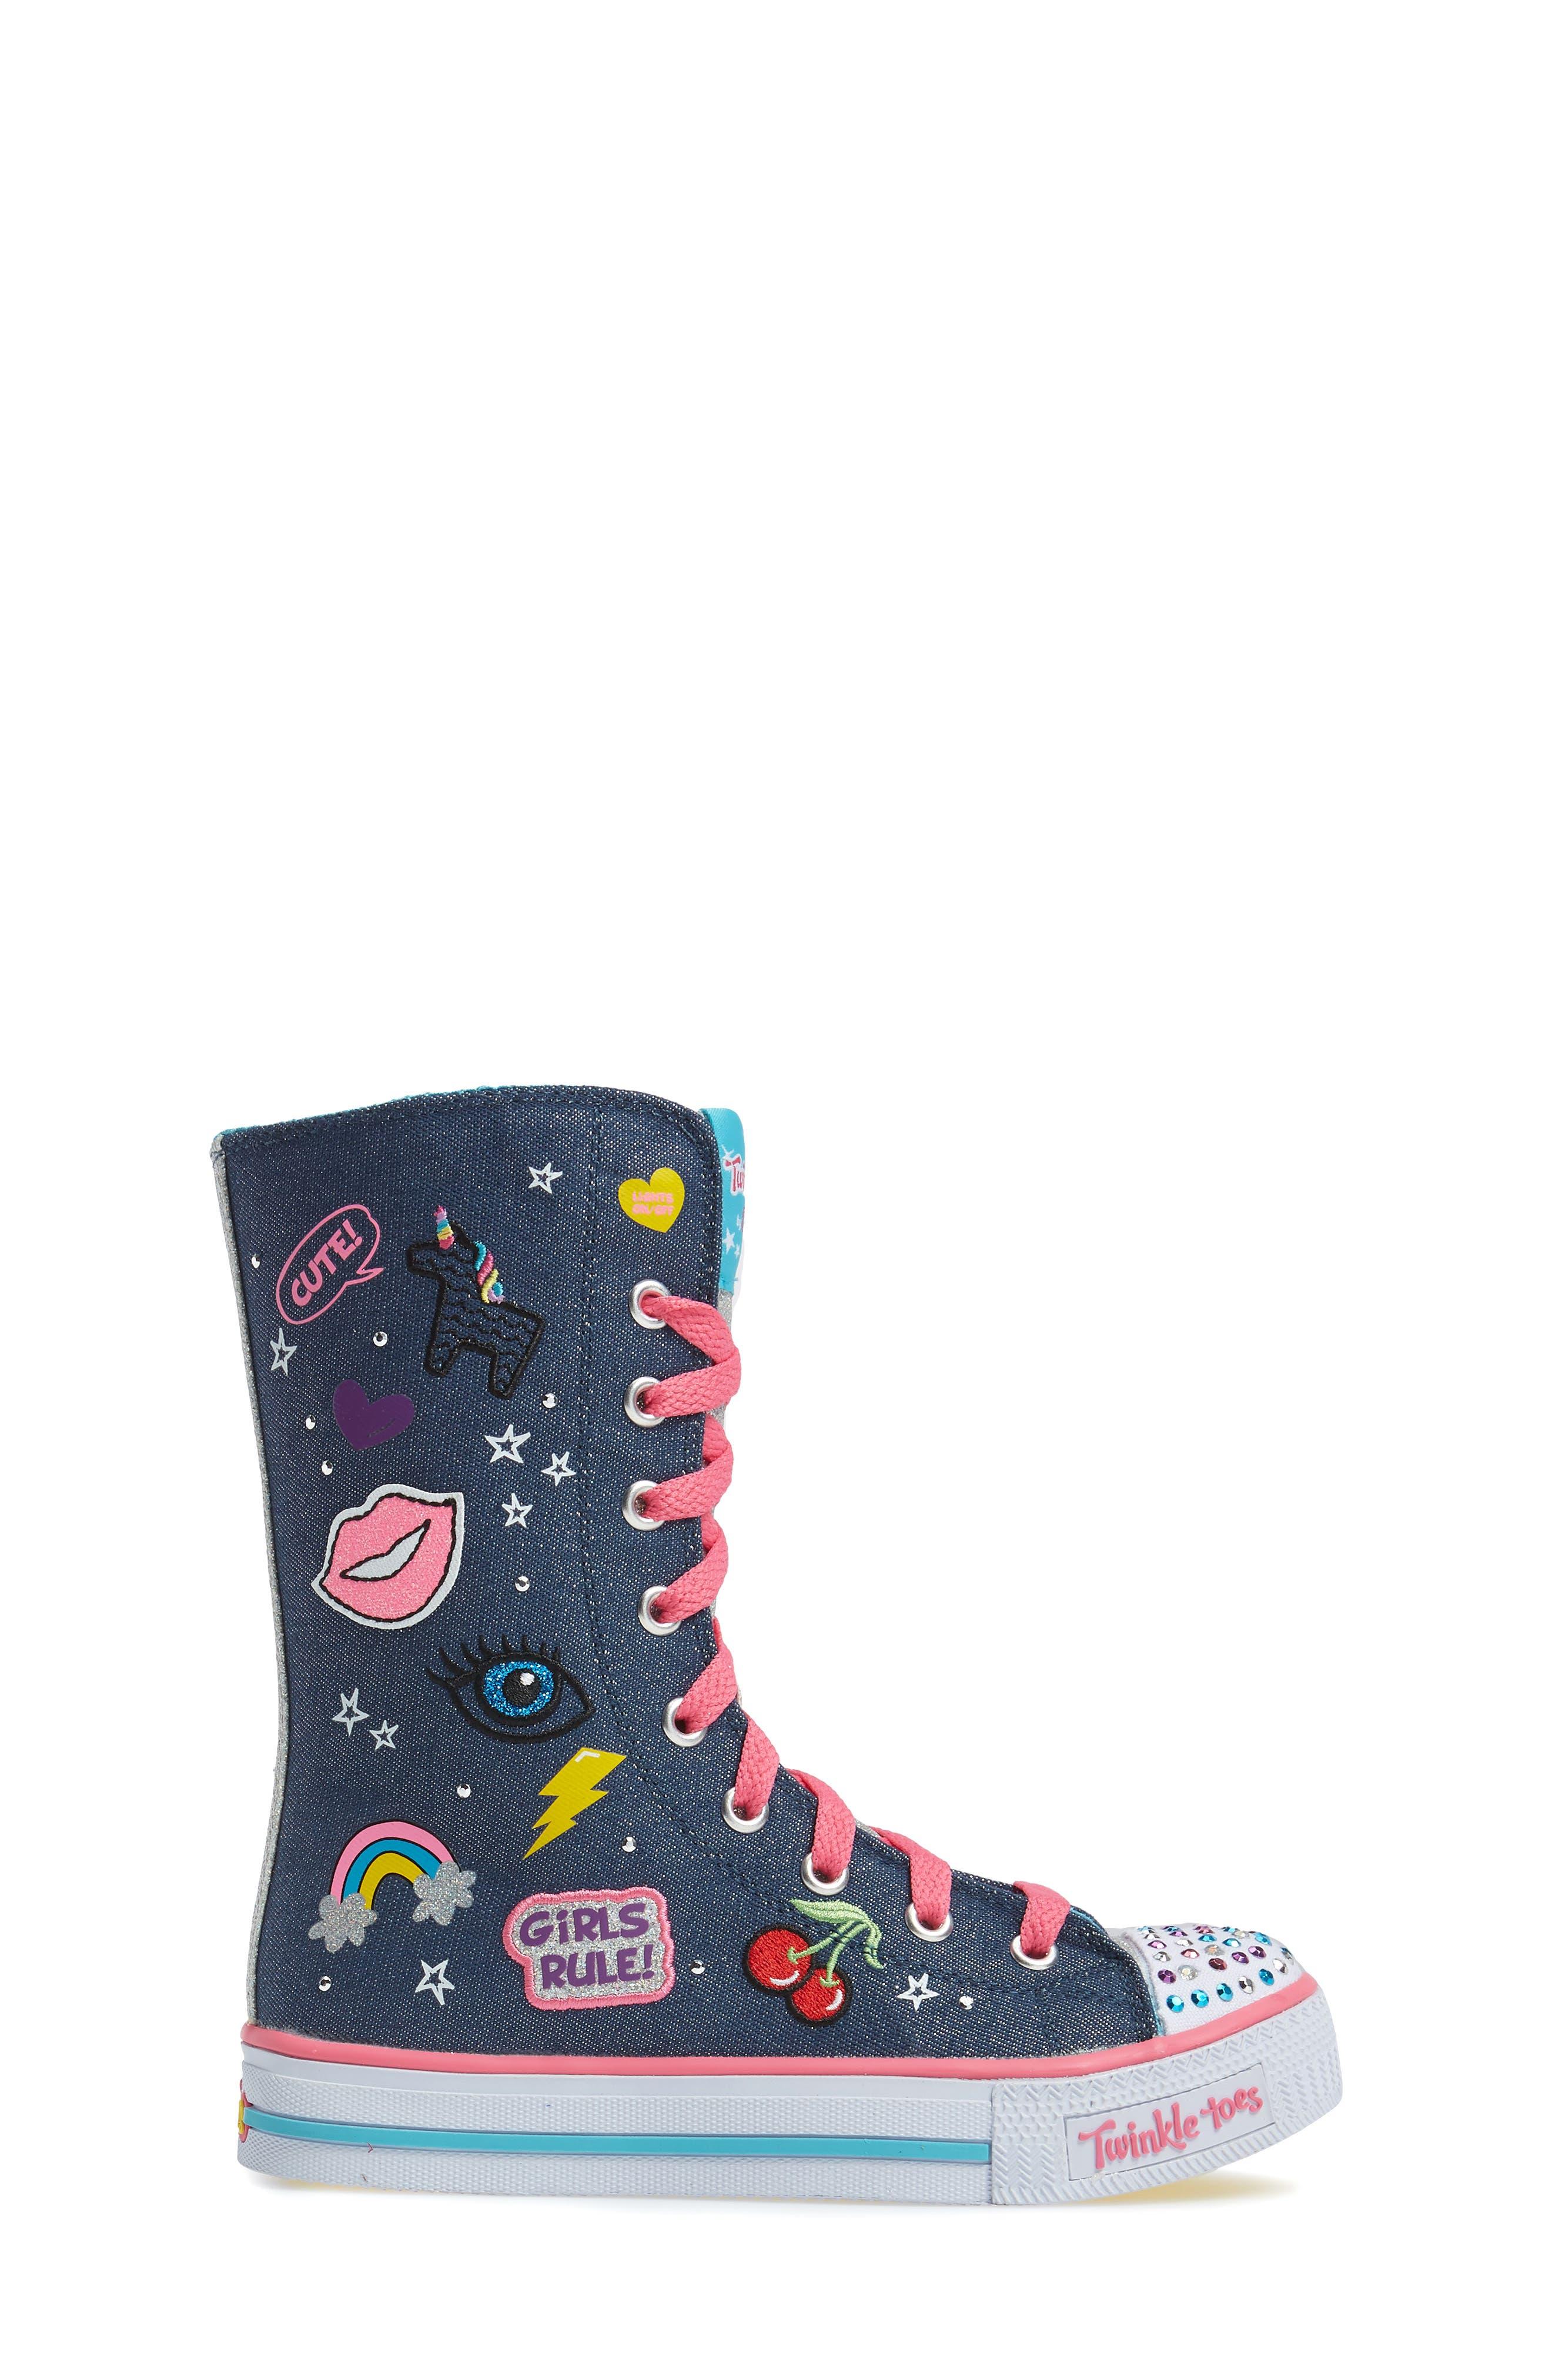 Twinkle Toes Shuffles Ultra High Top Sneaker,                             Alternate thumbnail 3, color,                             Denim/ Multi